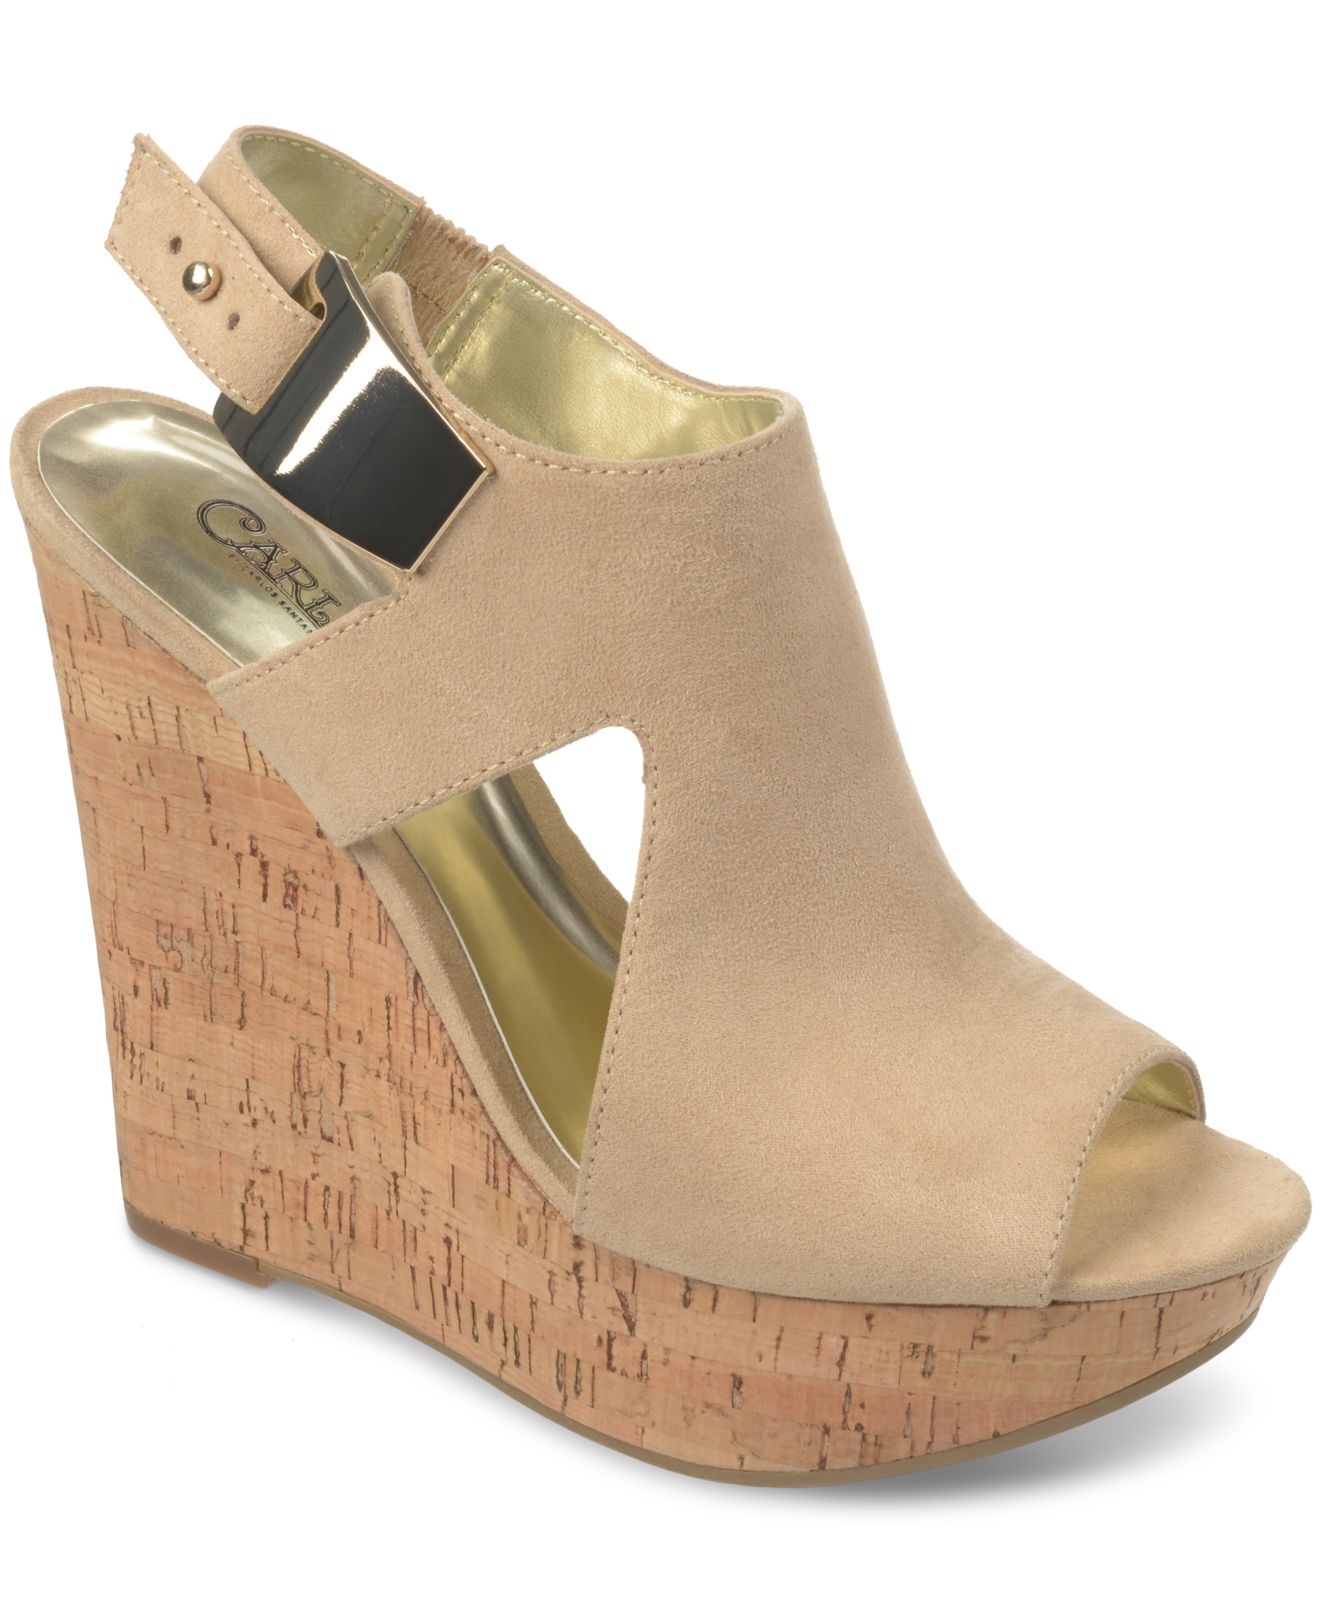 ef739c63d048 Lyst - Carlos By Carlos Santana Malor Platform Wedge Sandals in Natural